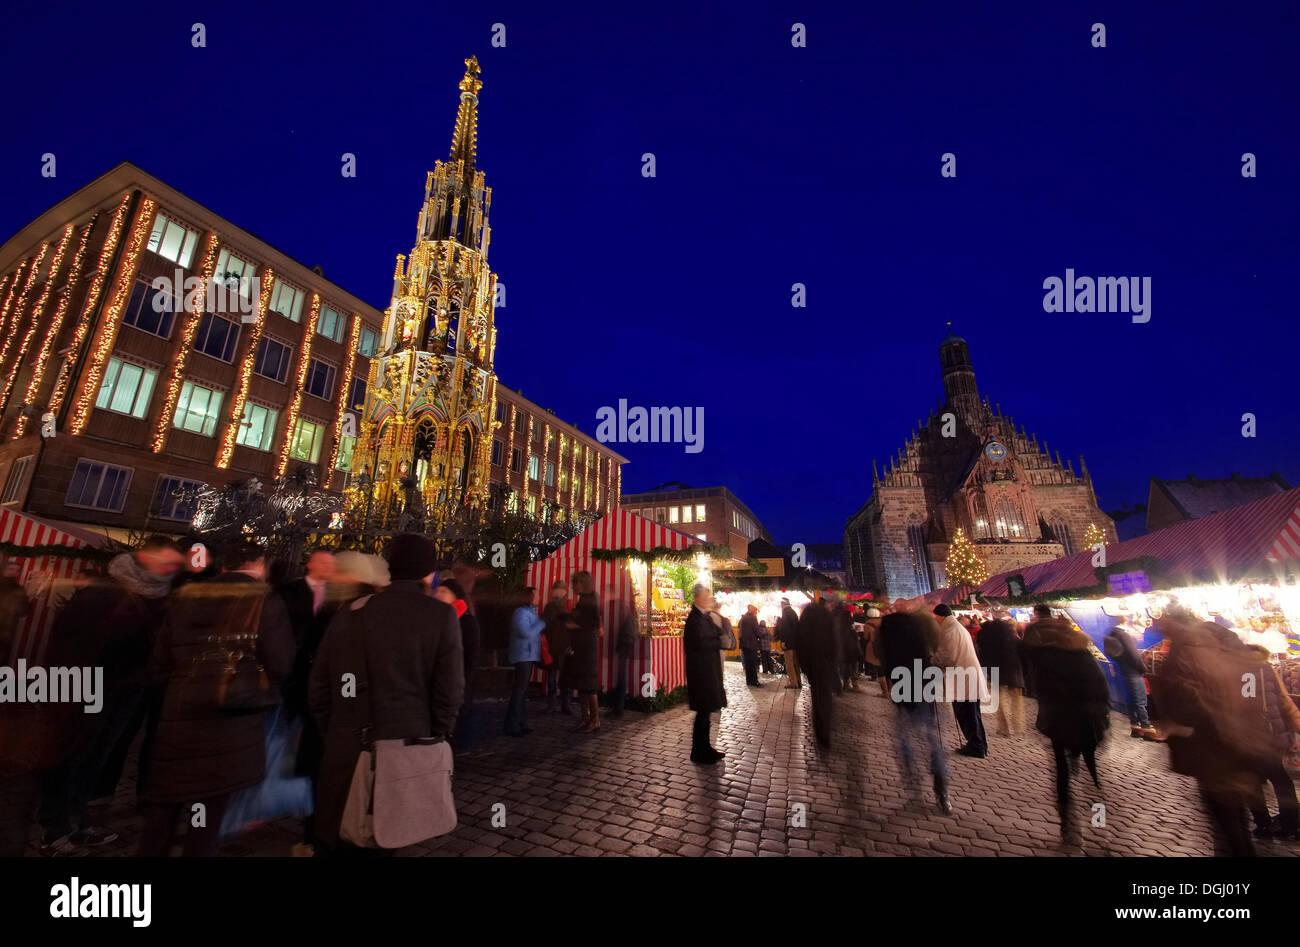 Nürnberg Weihnachtsmarkt - Nuremberg christmas market 05 - Stock Image